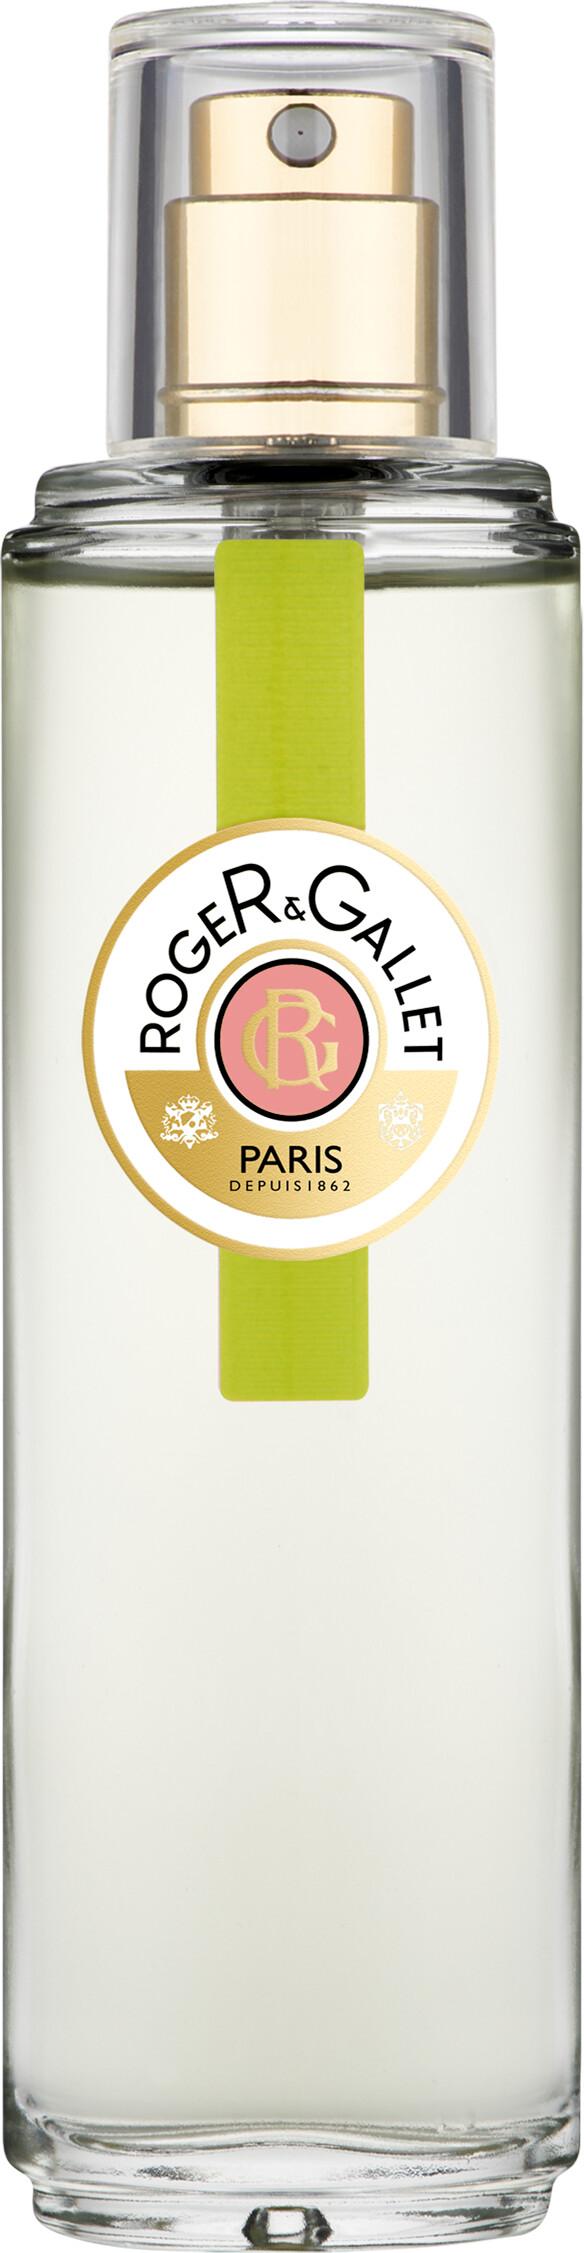 Roger & Gallet Fleur de Figuier Fresh Fragrant Water Spray 30ml